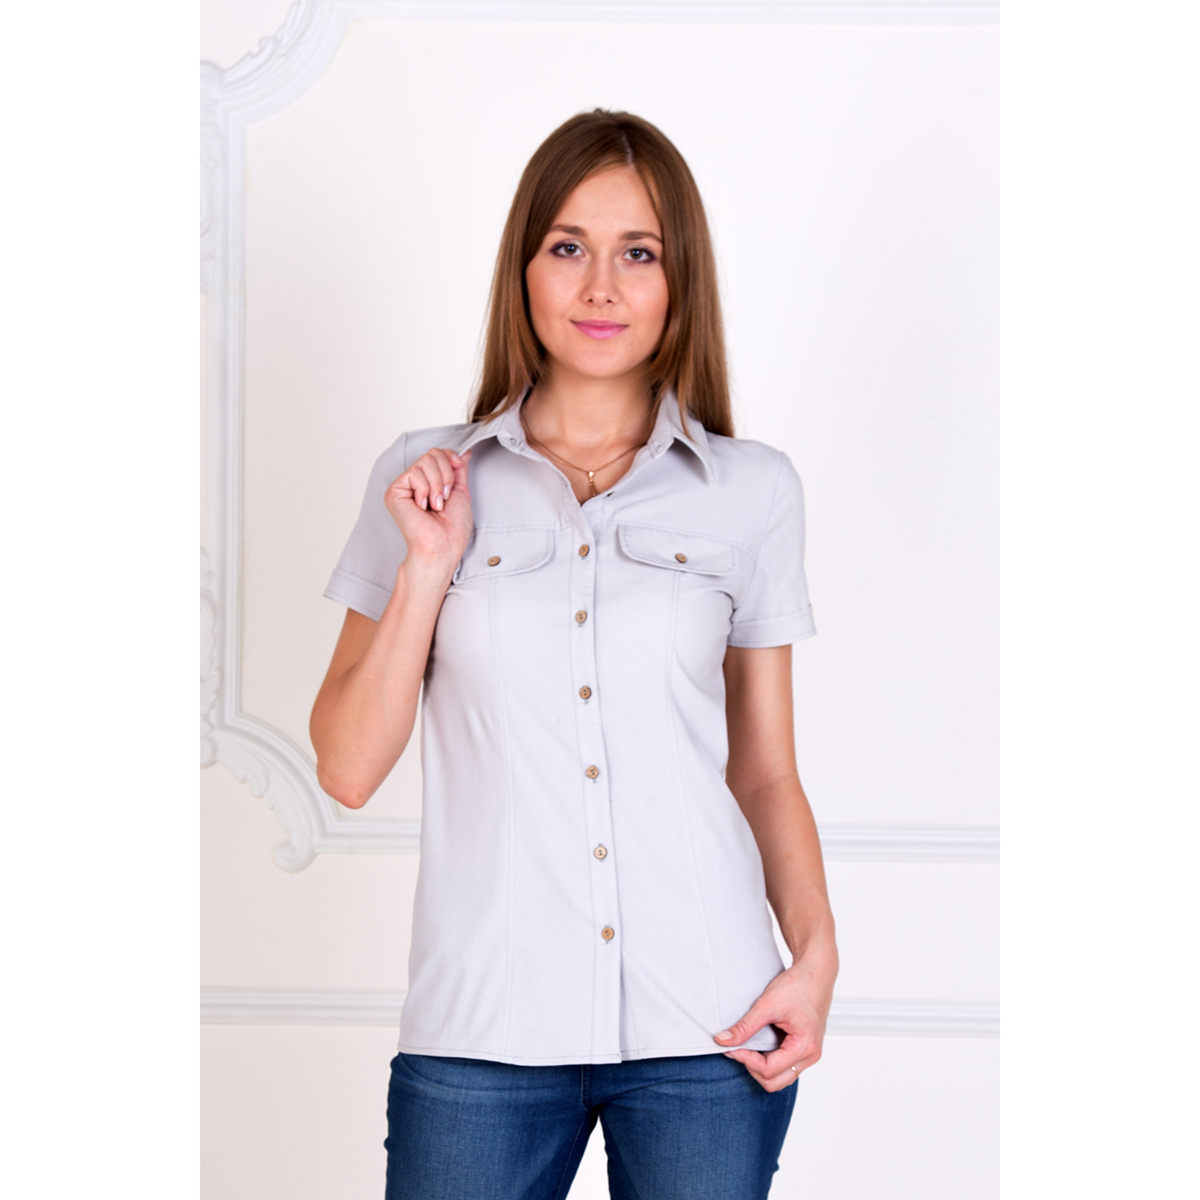 Женская рубашка Александра Серый, размер 46Блузки, майки, кофты<br>Обхват груди:92 см<br>Обхват талии:74 см<br>Обхват бедер:100 см<br>Рост:167 см<br><br>Тип: Жен. рубашка<br>Размер: 46<br>Материал: Хлопок